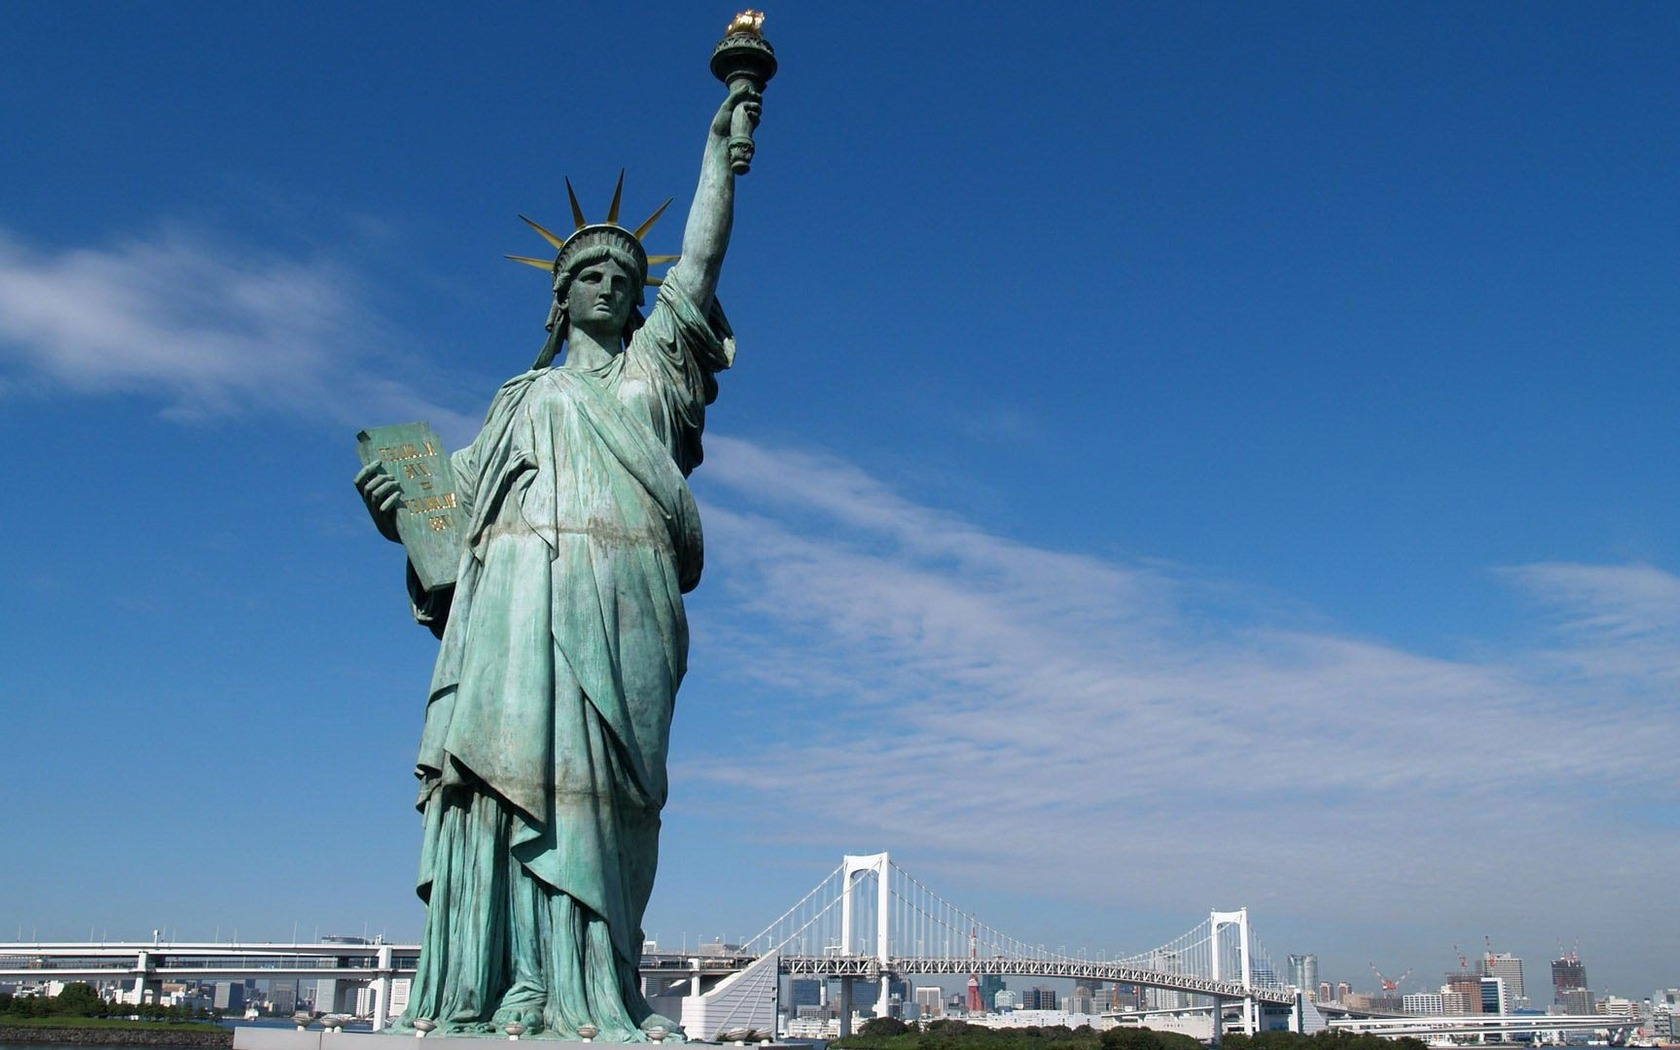 Download Statue of Liberty New York City wallpaper 1680x1050